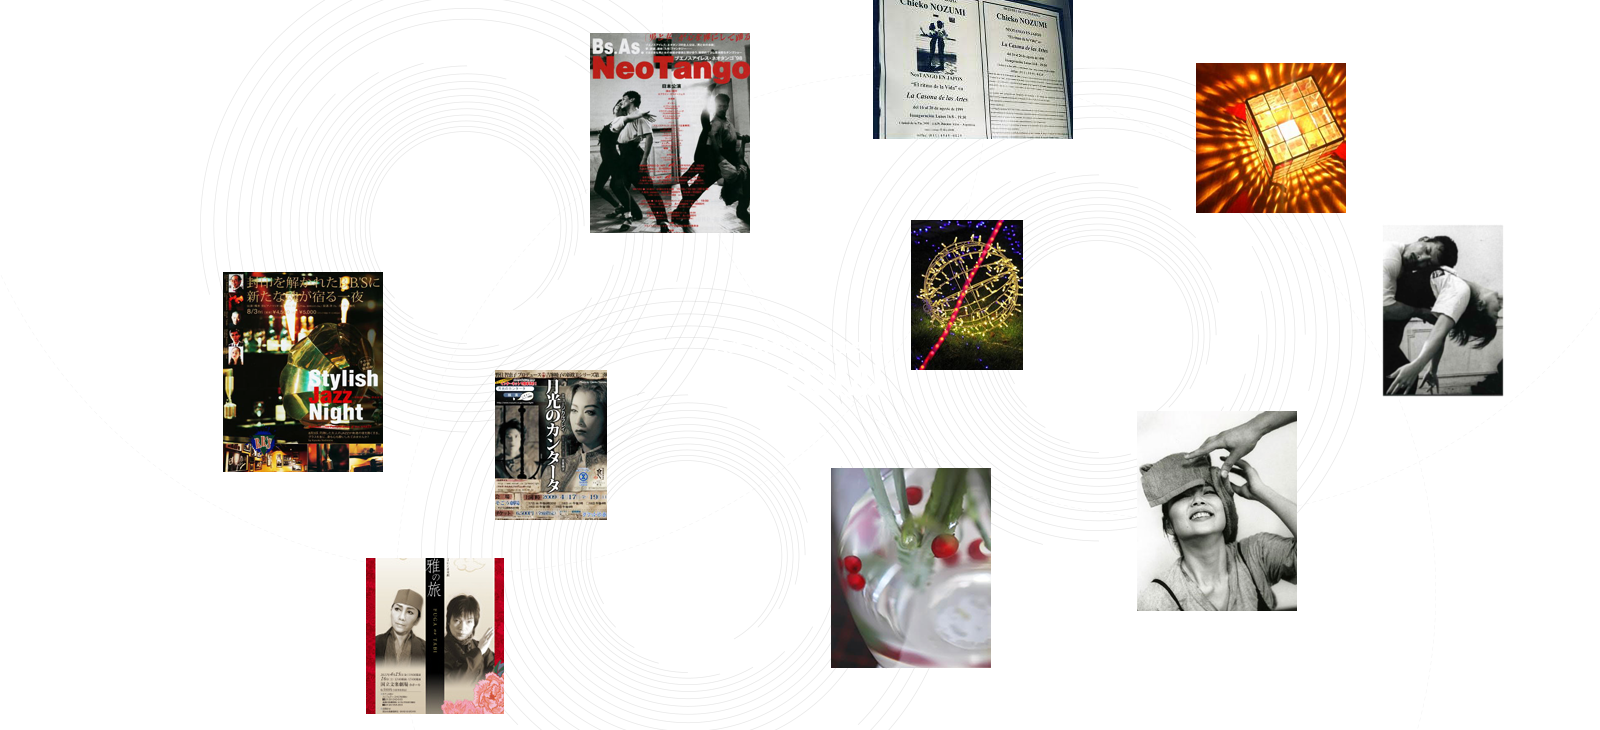 Art Management NOZUMI 完成を言霊に 瞬間を表現する 世界観をまとめる